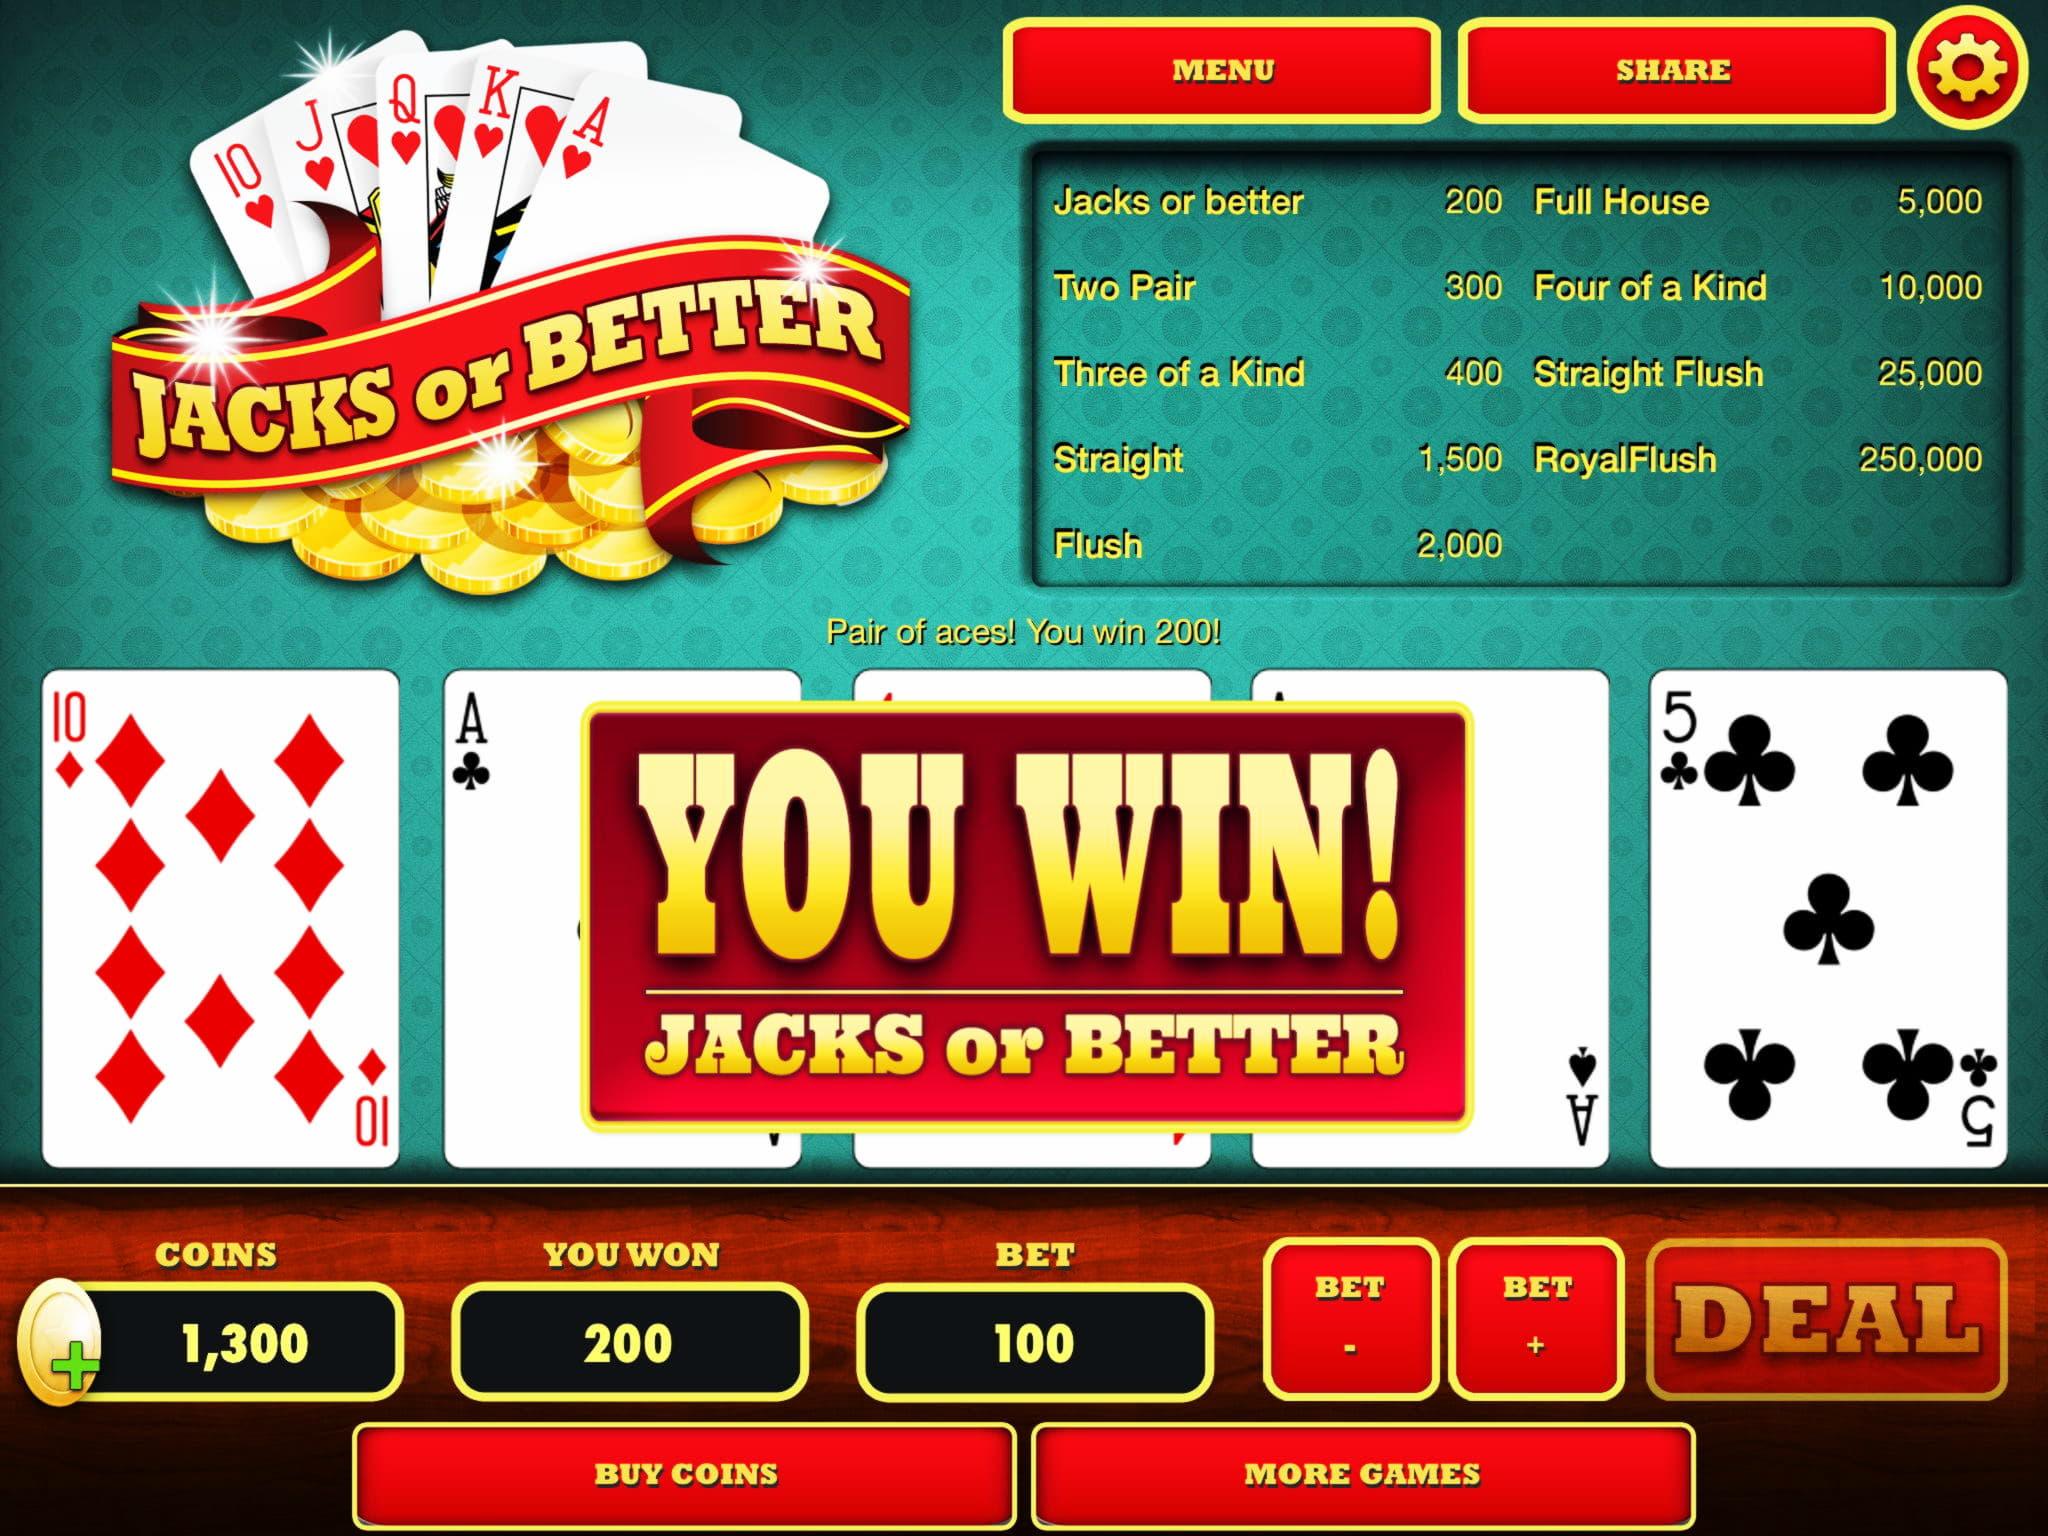 Eur 3365 ไม่มีโบนัสเงินฝากคาสิโนที่ Uptown Pokies Casino